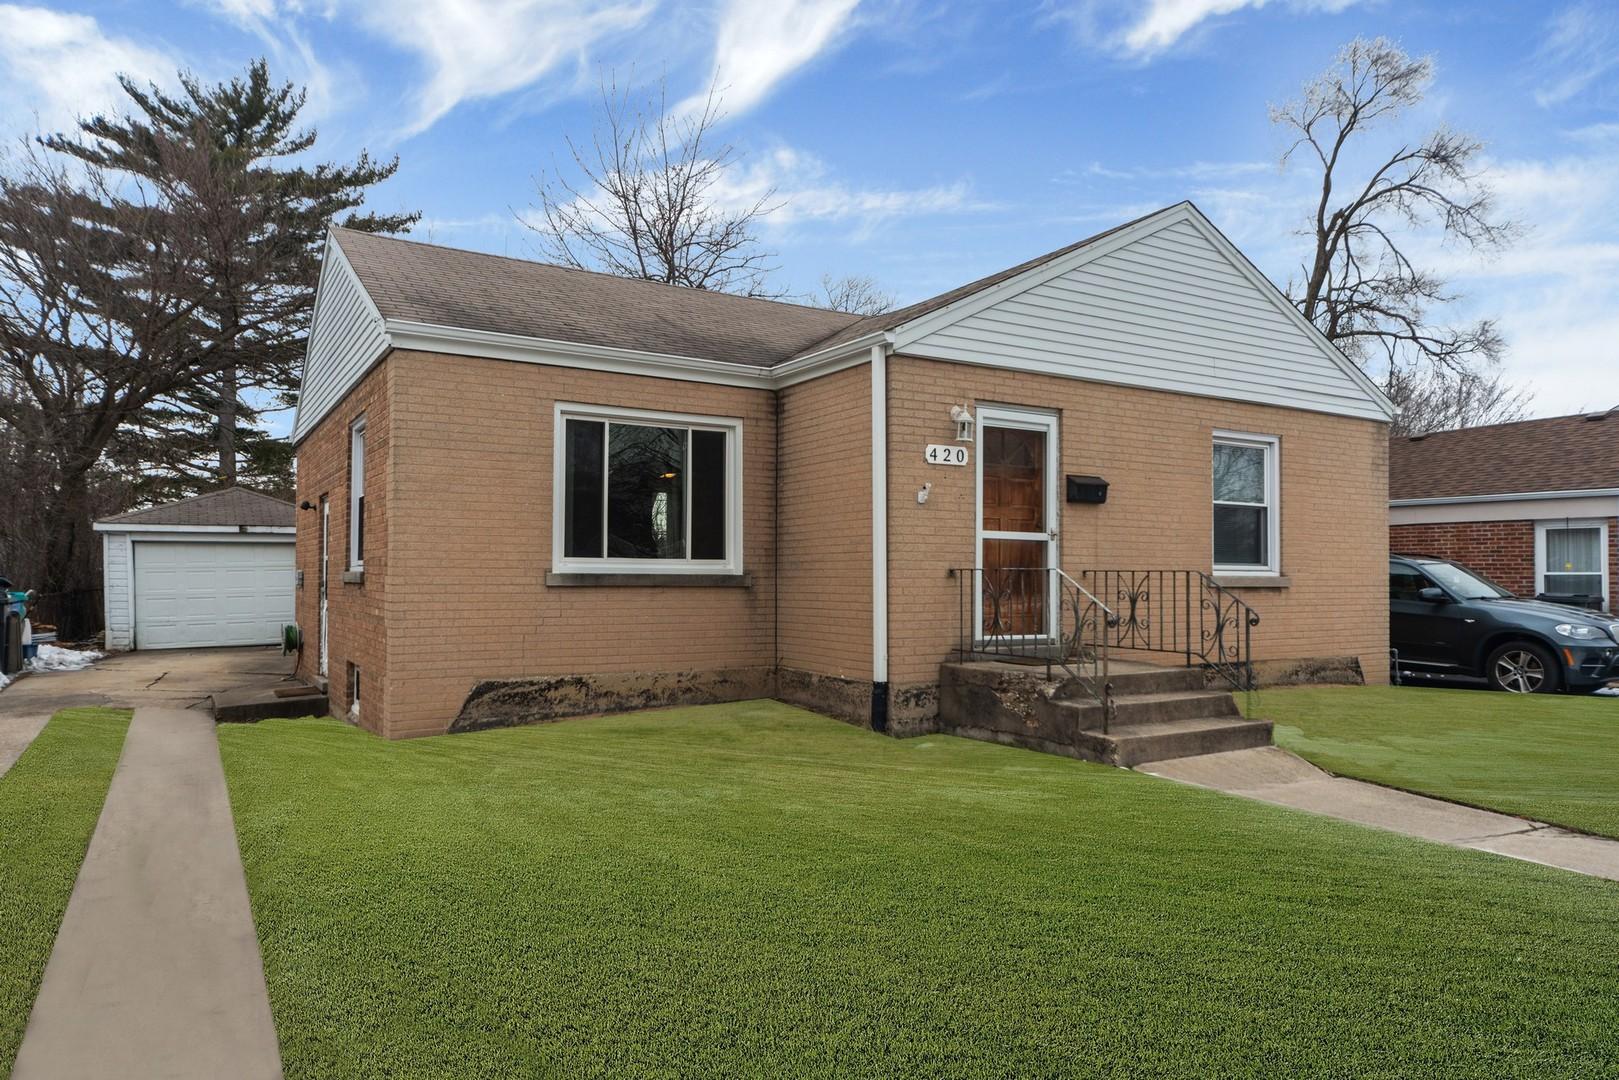 420 North Hillside, Hillside, Illinois, 60162